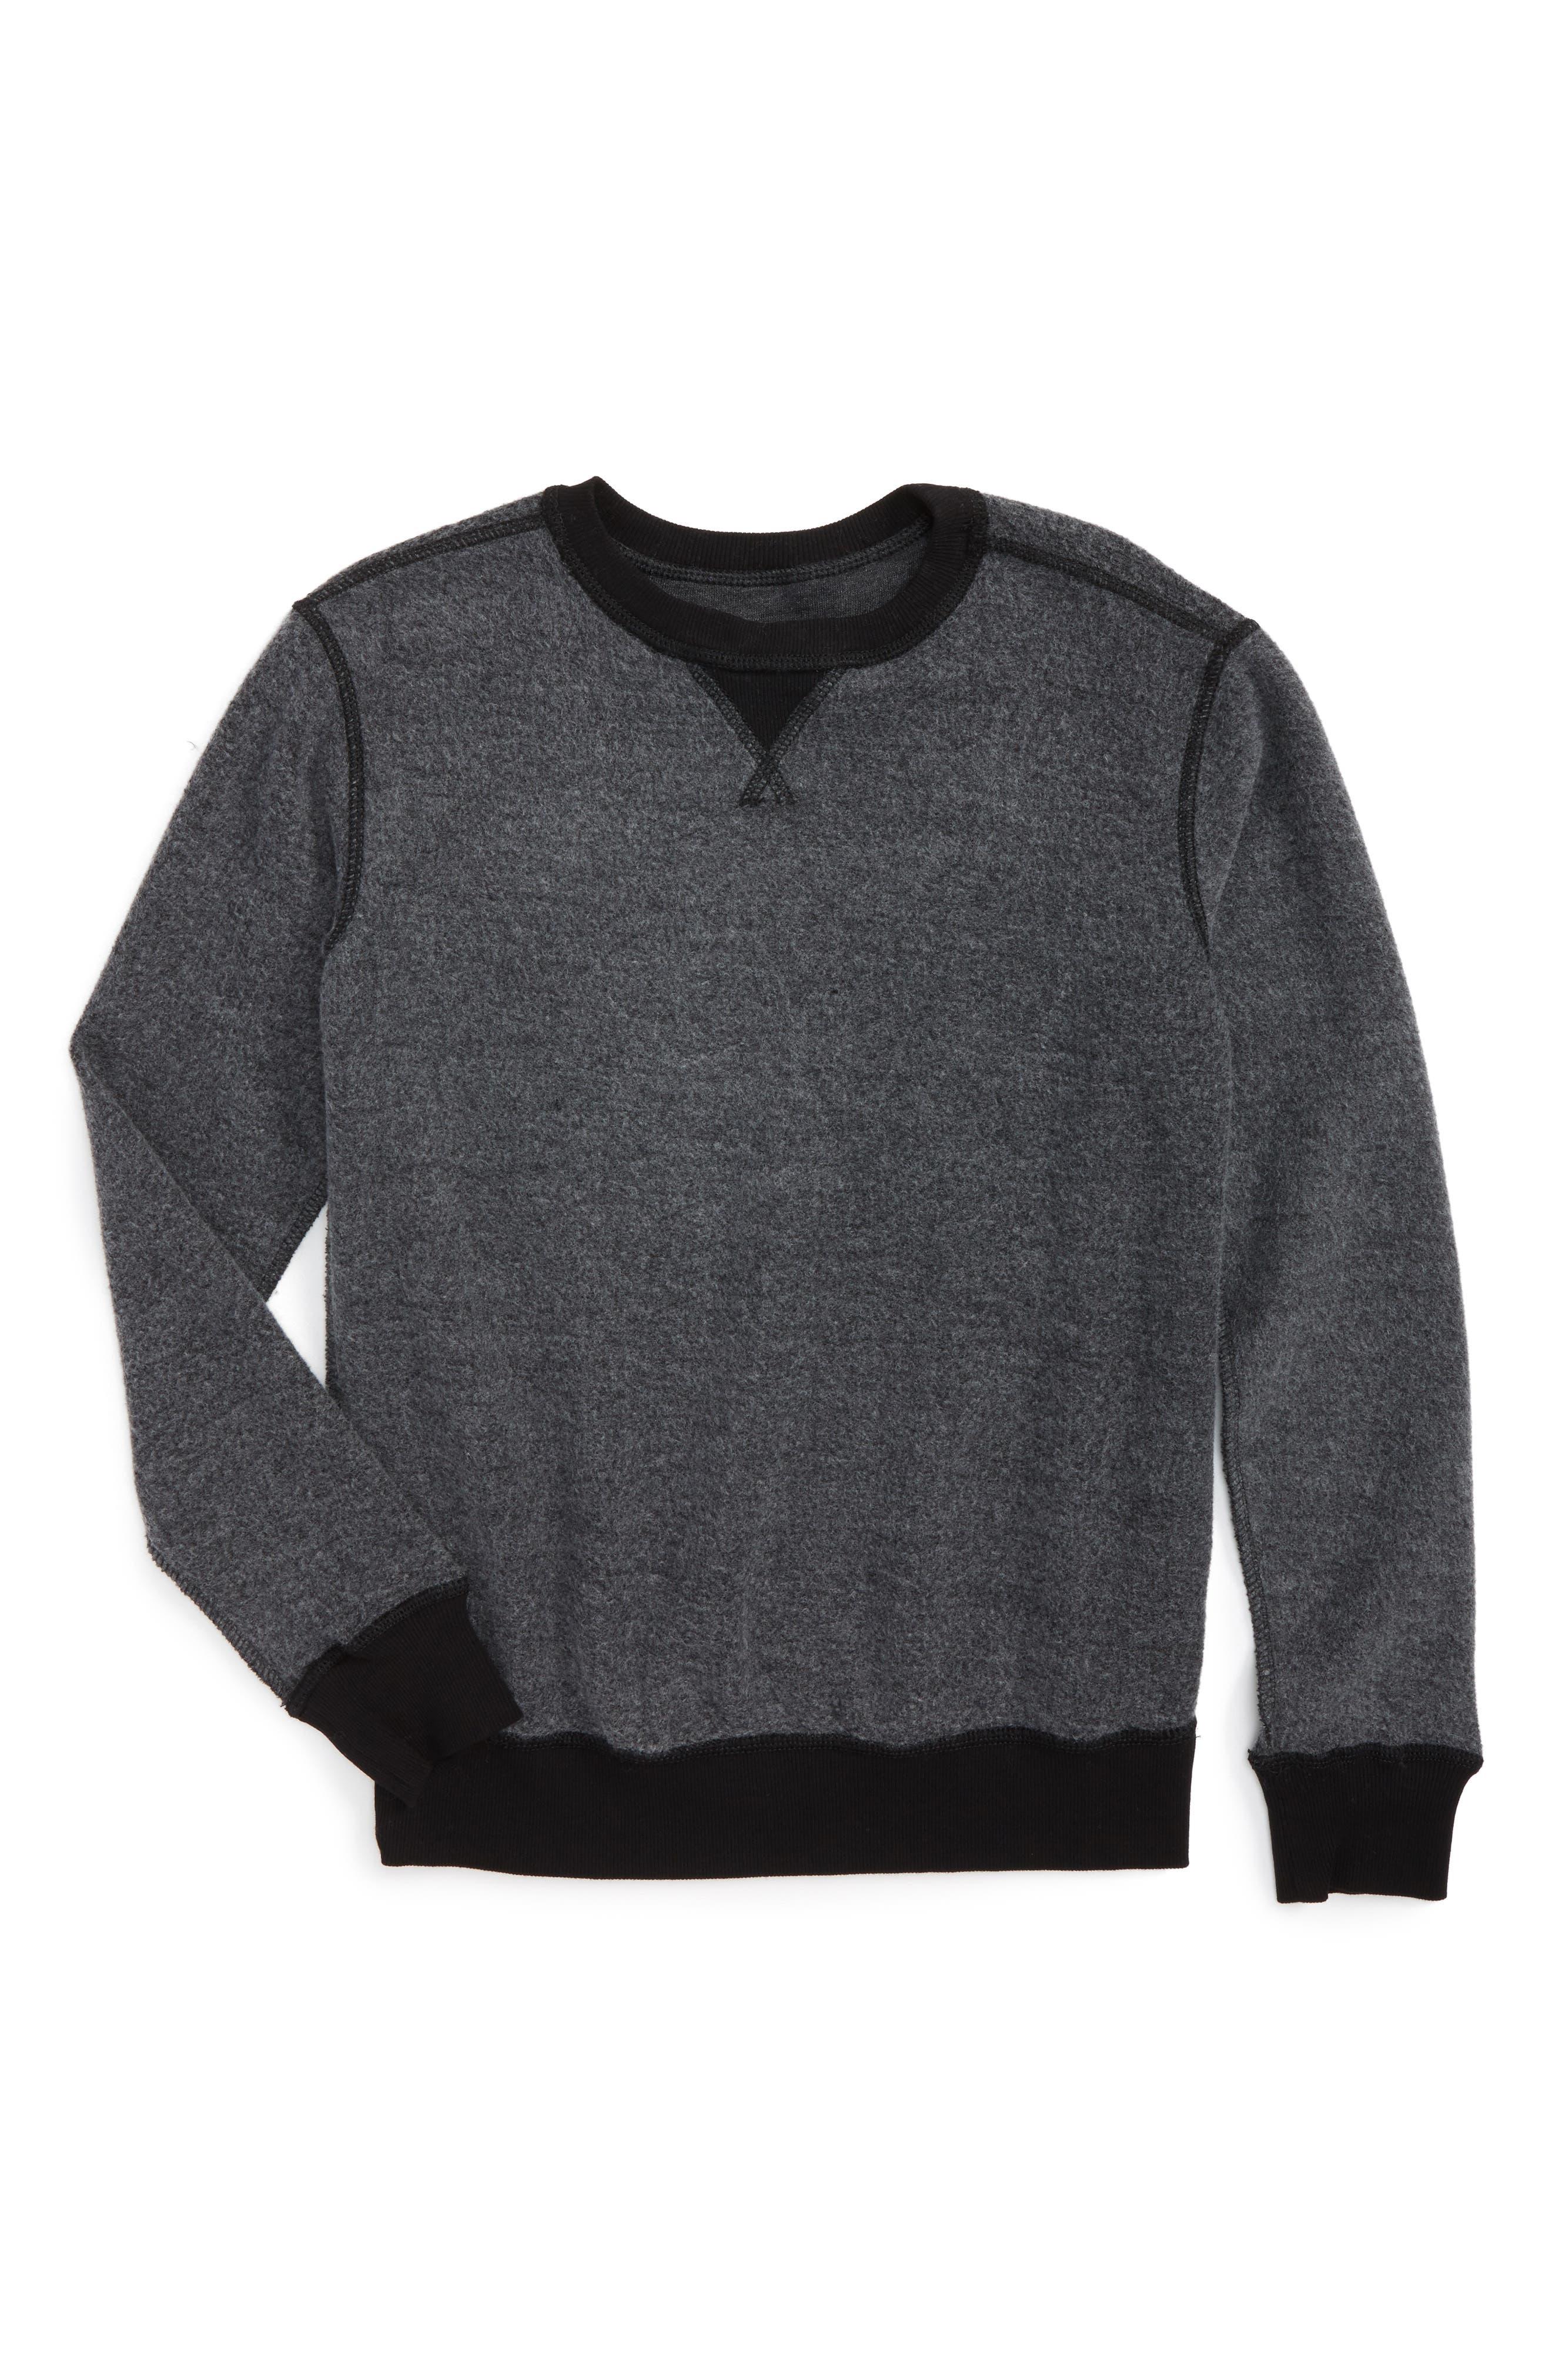 Reverse Crewneck Sweatshirt,                         Main,                         color, Grey Charcoal Heather